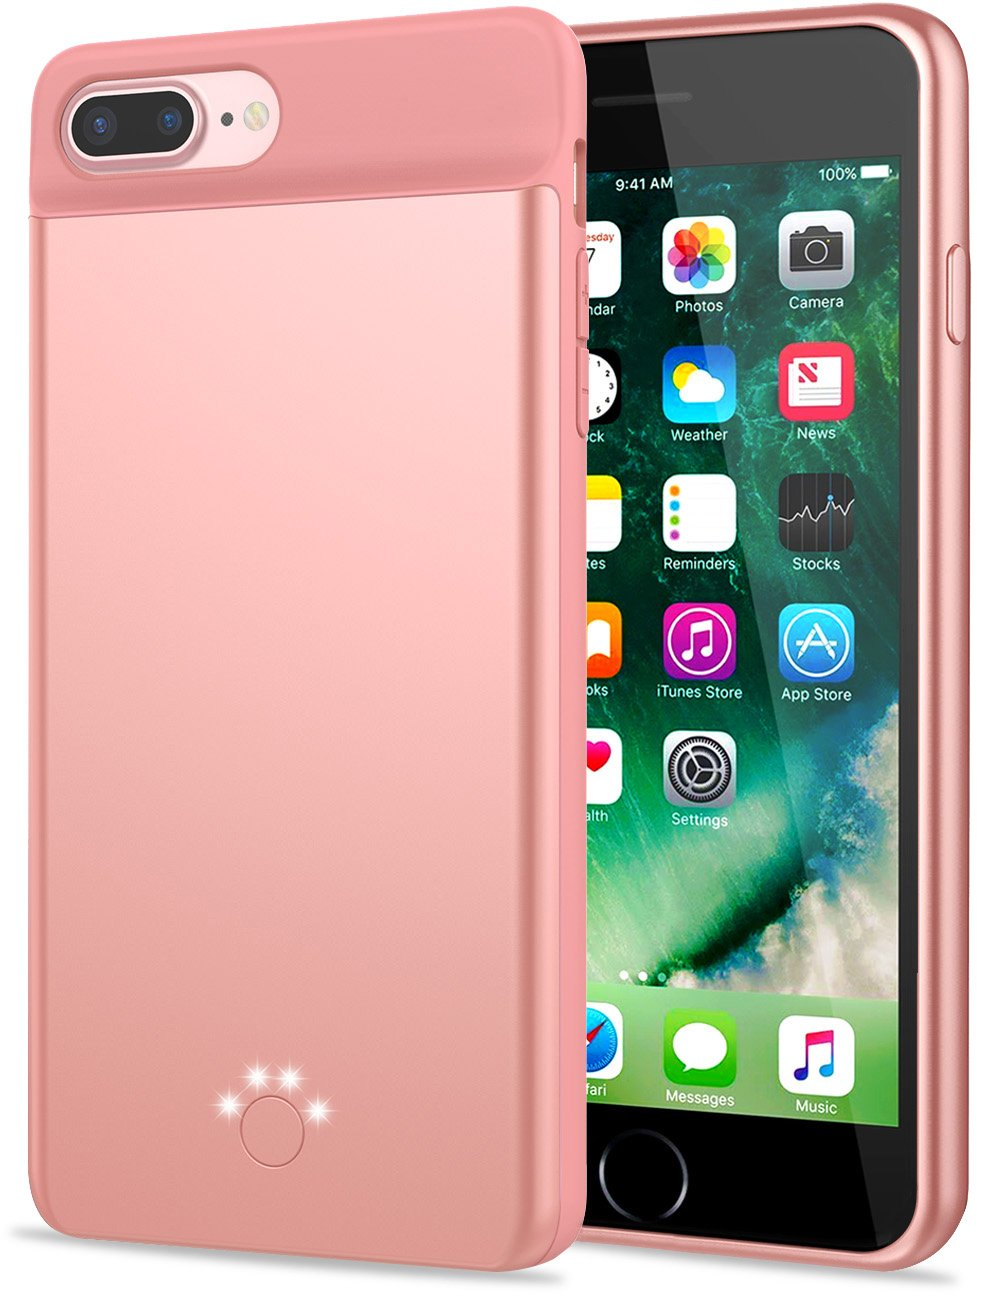 iPhone 8 Plus 7 Plus Battery Case, Emishine 4000mAh Slim Rechargeable External Battery Portable Charging Case for Apple iPhone 8 Plus 7 Plus … (Rose Gold)